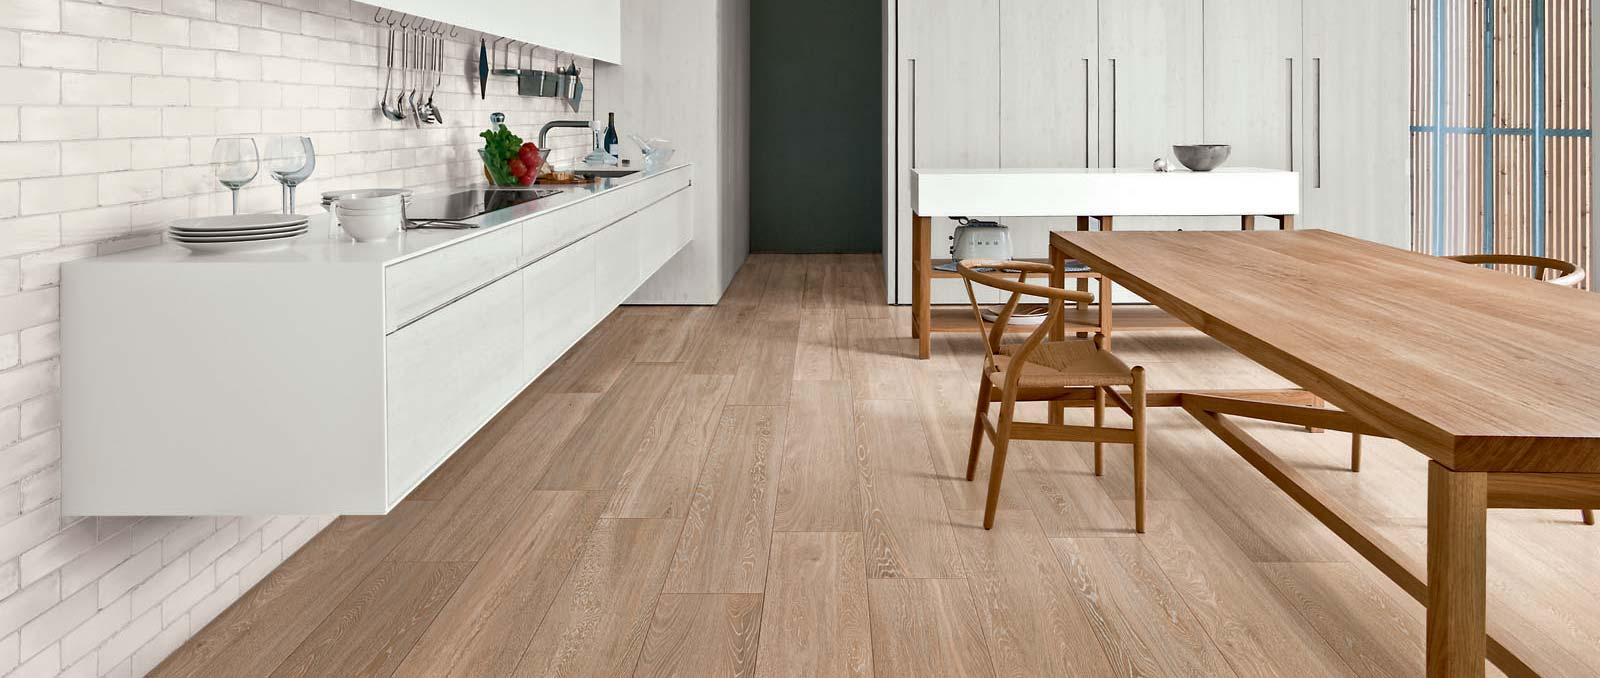 Total White Look: Cucina Bianca e Moderna | Ragno